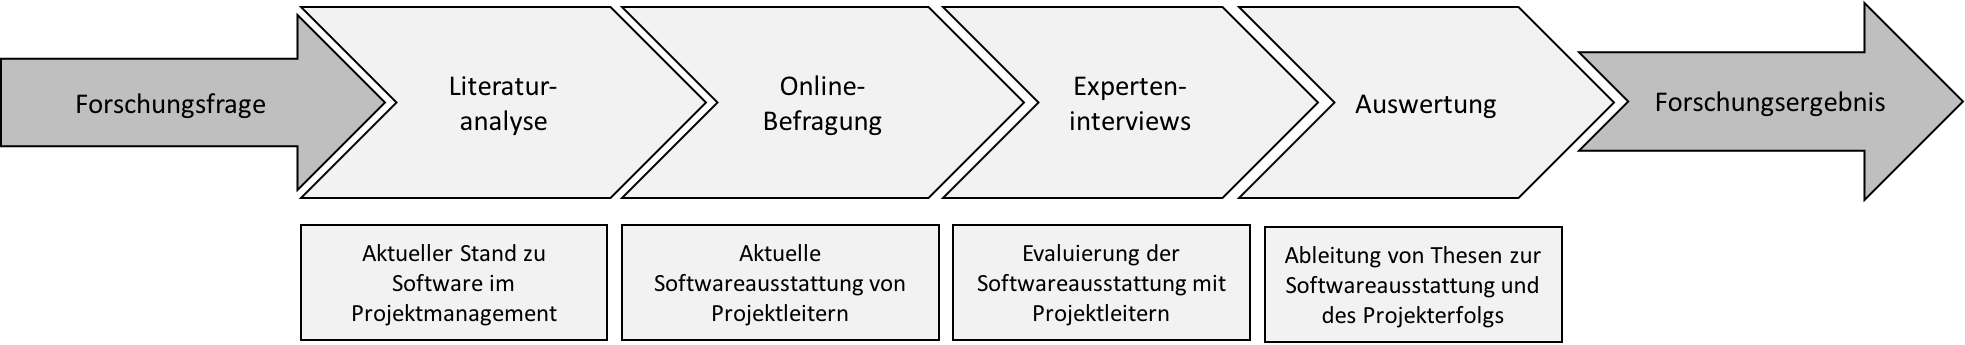 Forschungsdesign-qualitativ-quantitativ